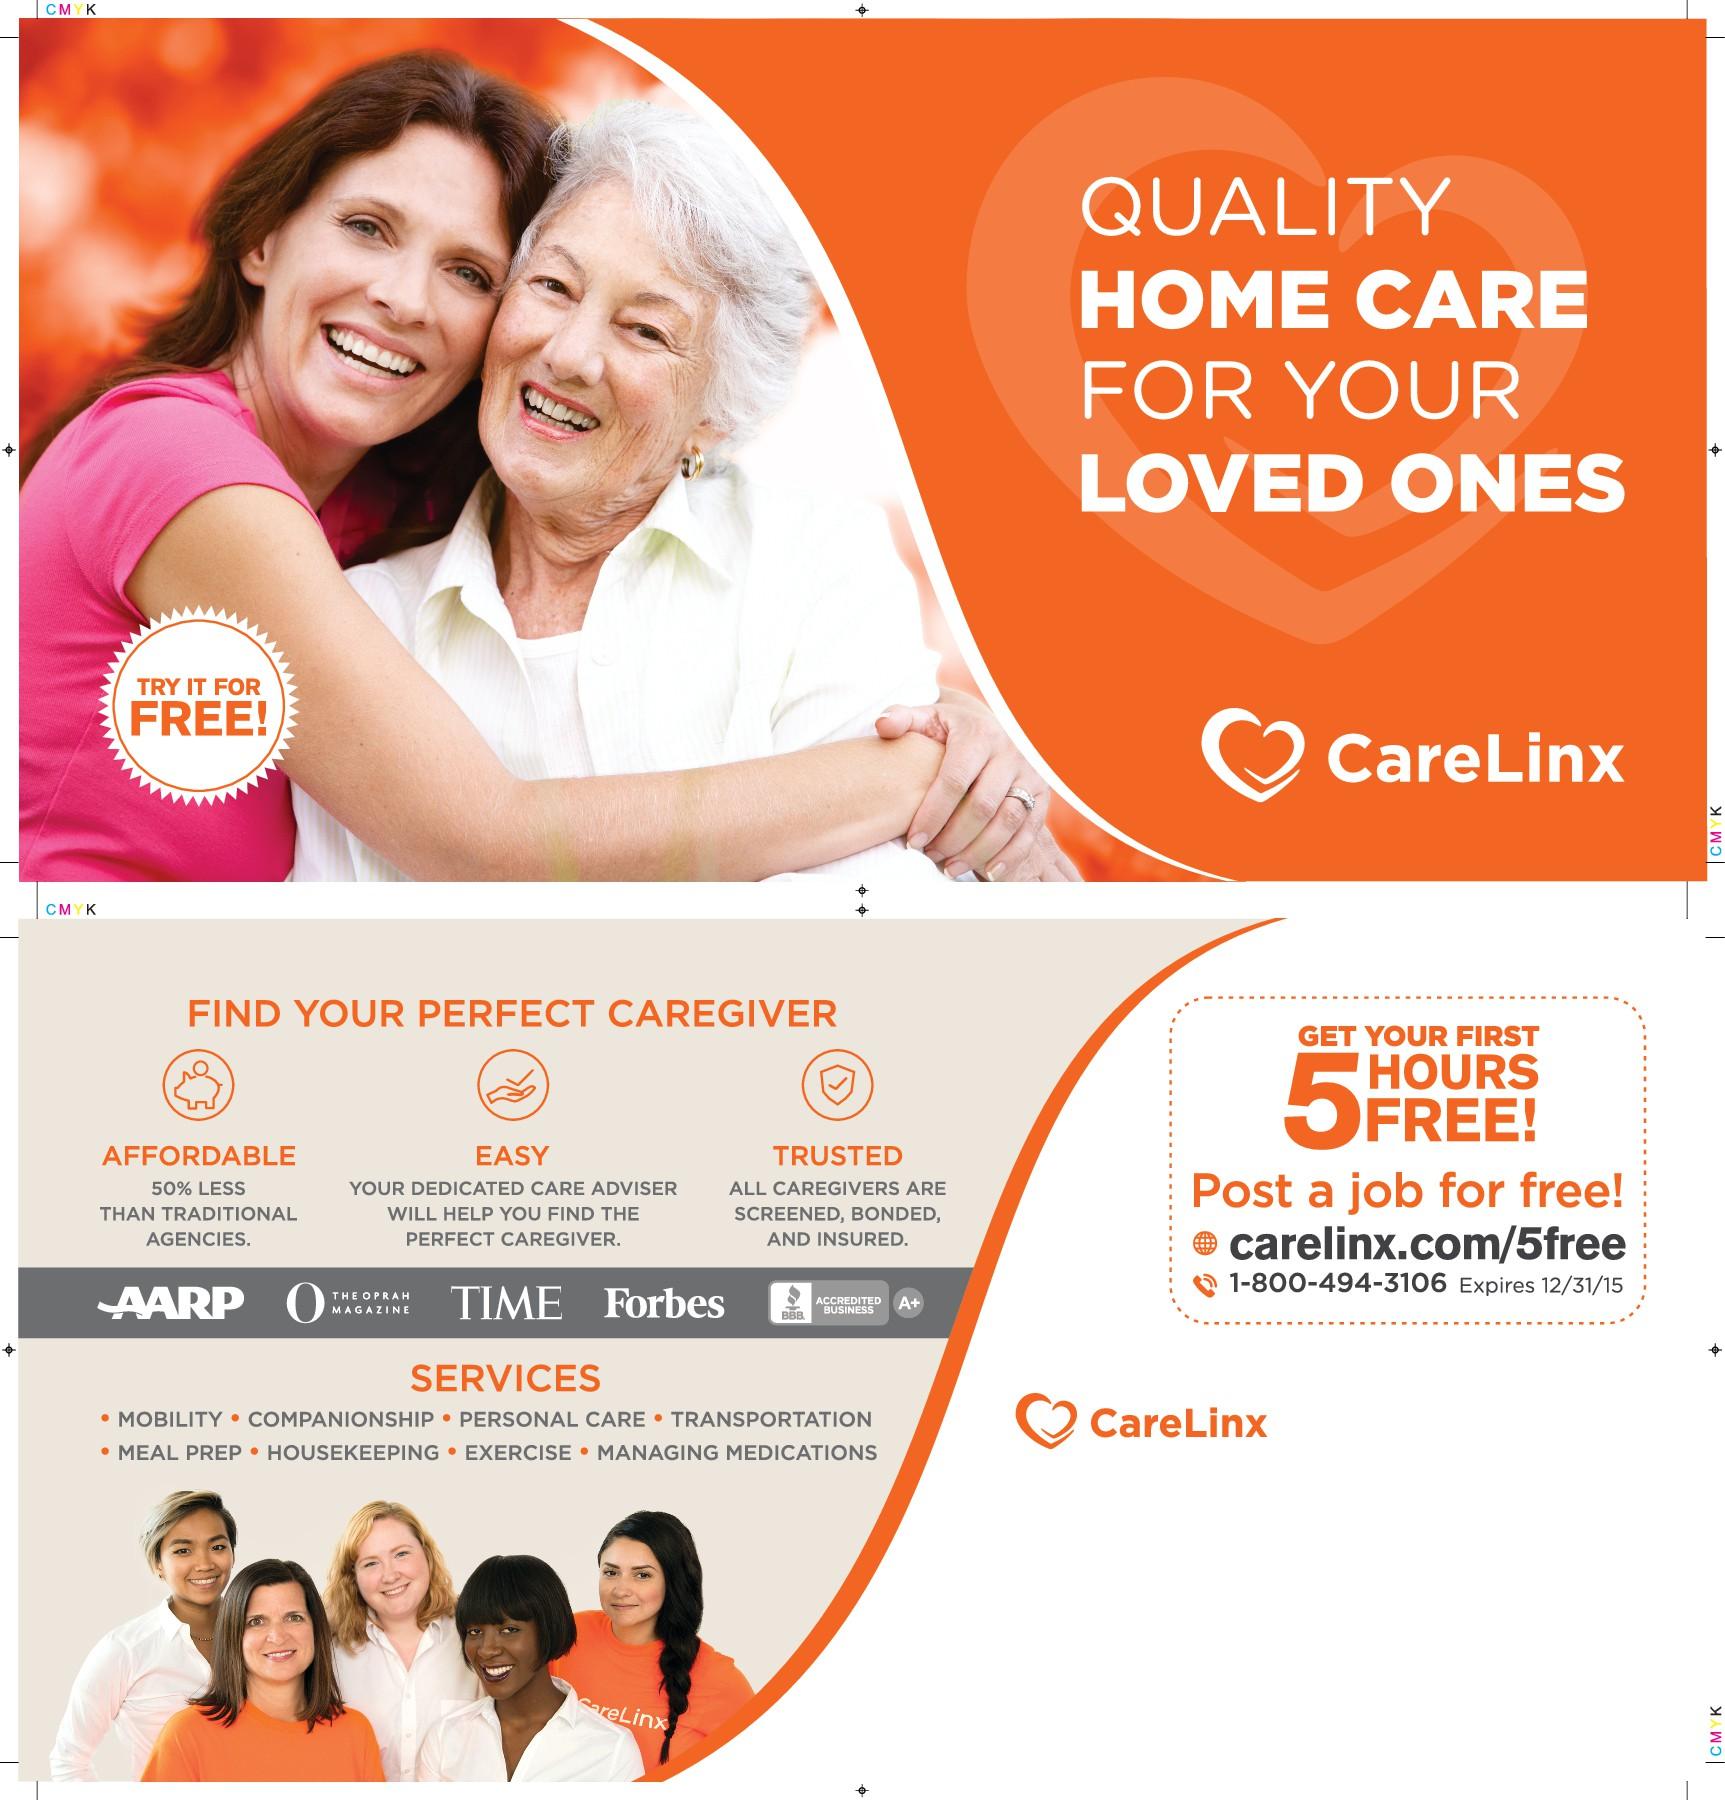 Create a postcard advertisement for an eldercare company